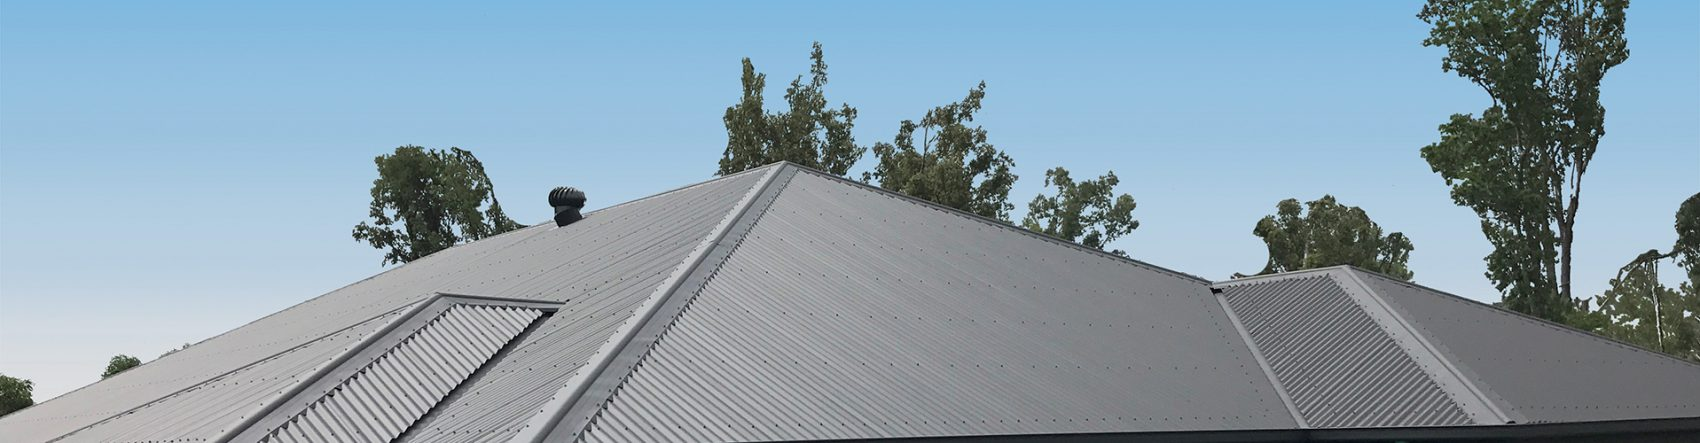 Pantex Matt Steel Roof